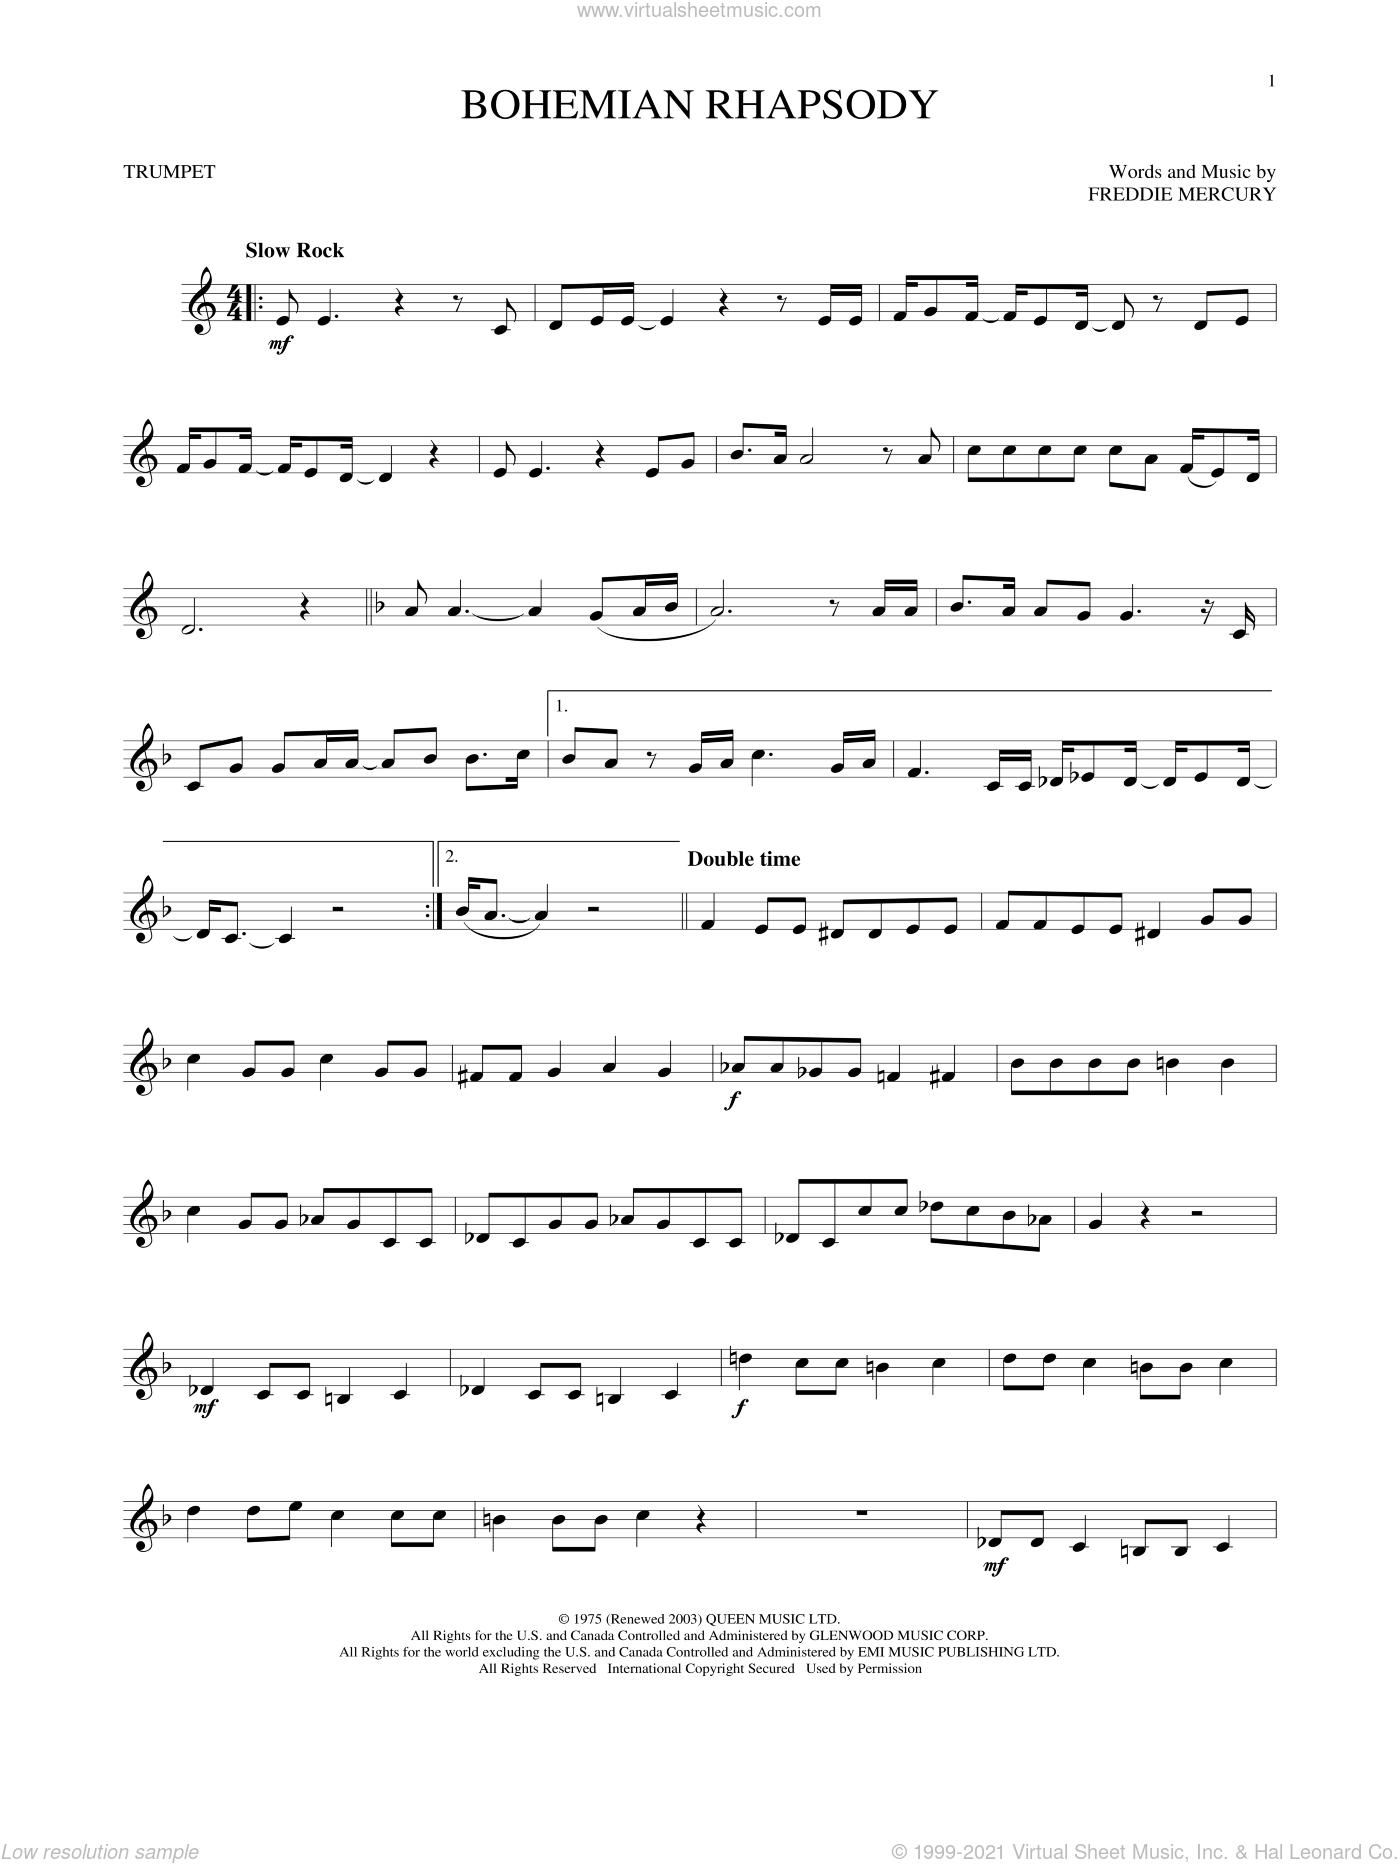 Bohemian Rhapsody sheet music for trumpet solo by Queen and Freddie Mercury, intermediate skill level